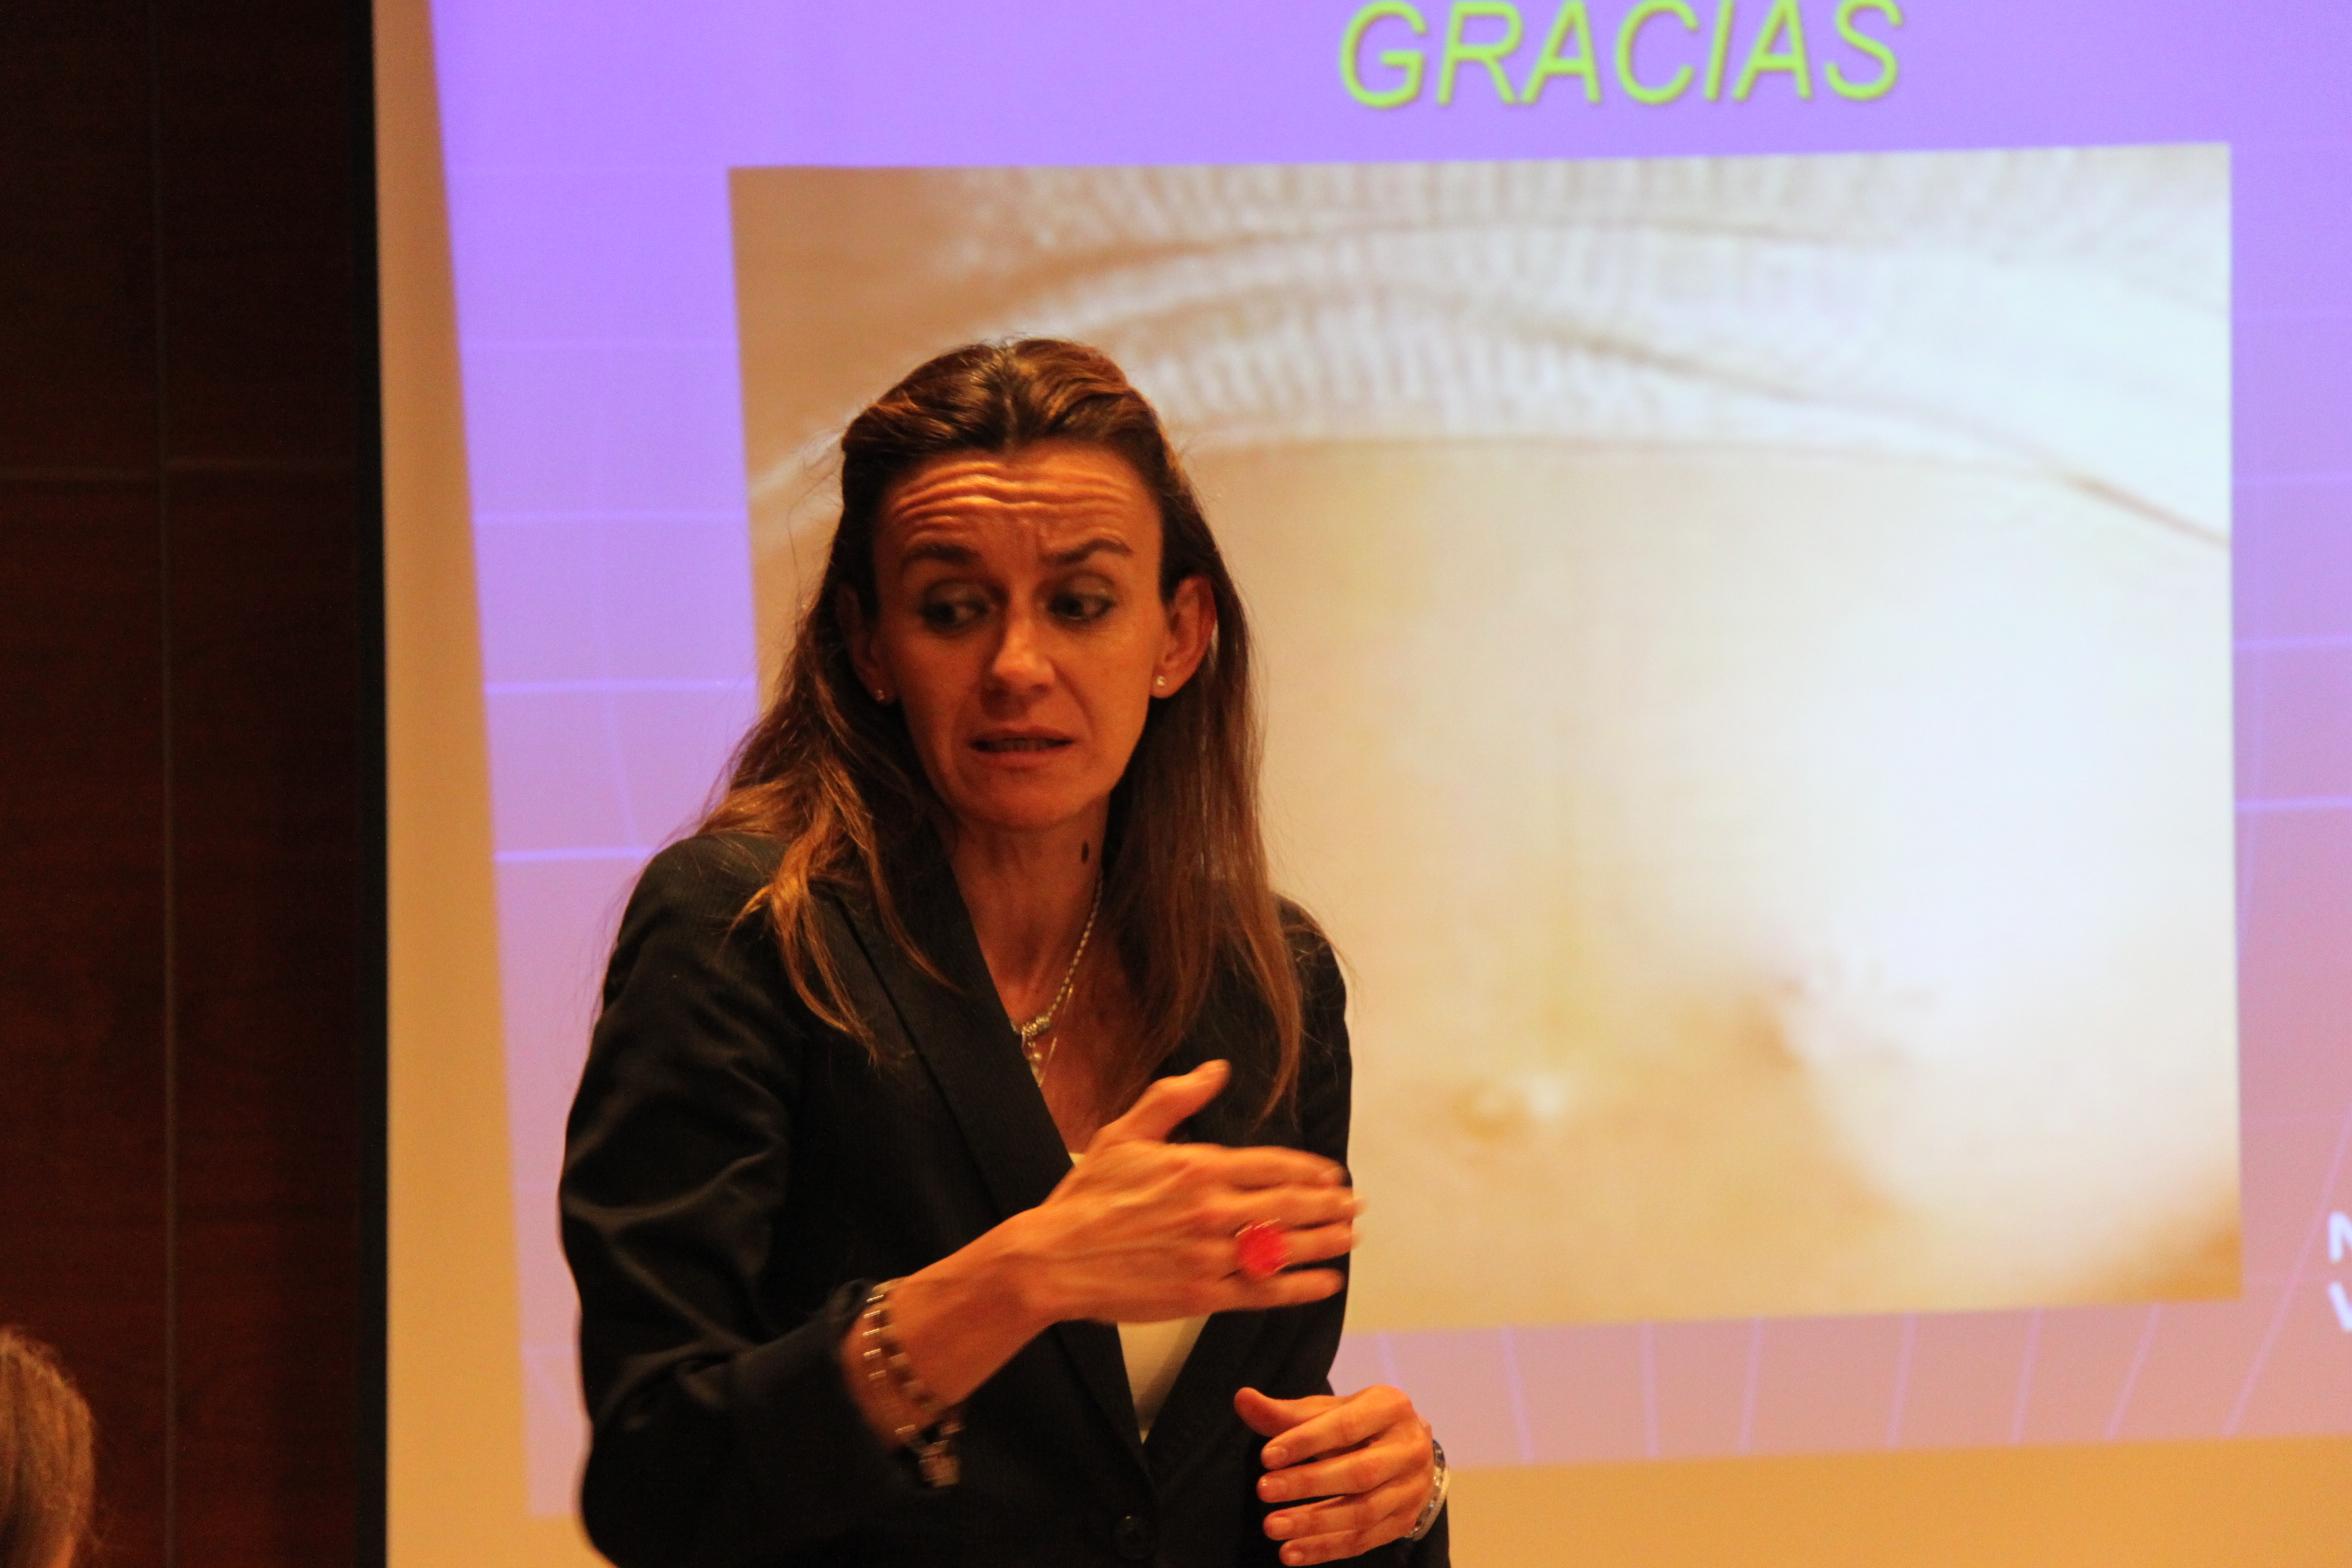 Dra Vidales